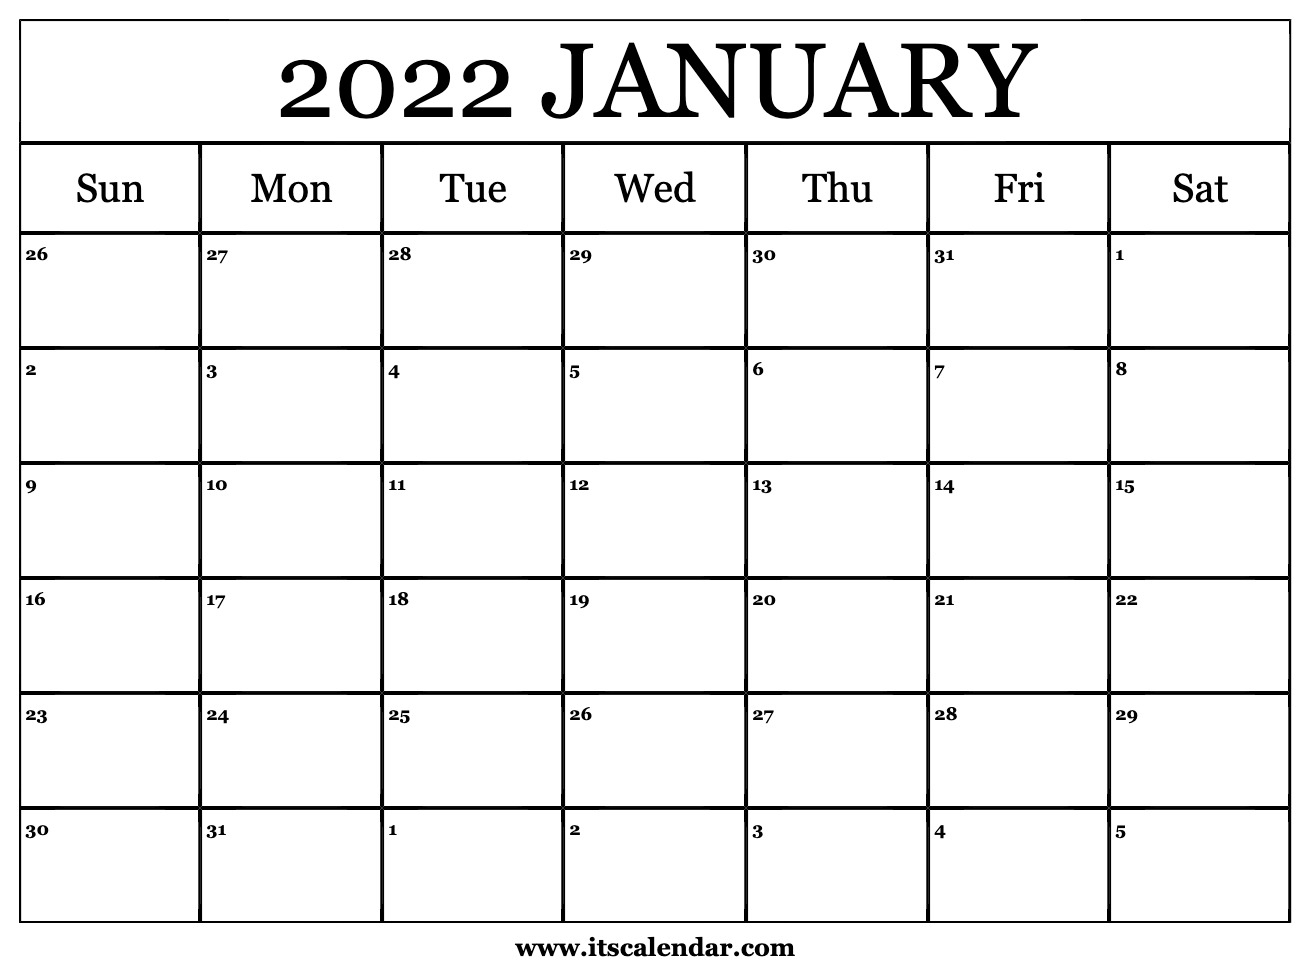 Free Printable January 2022 Calendar Regarding Printable Calendar October 2022 To January 2022